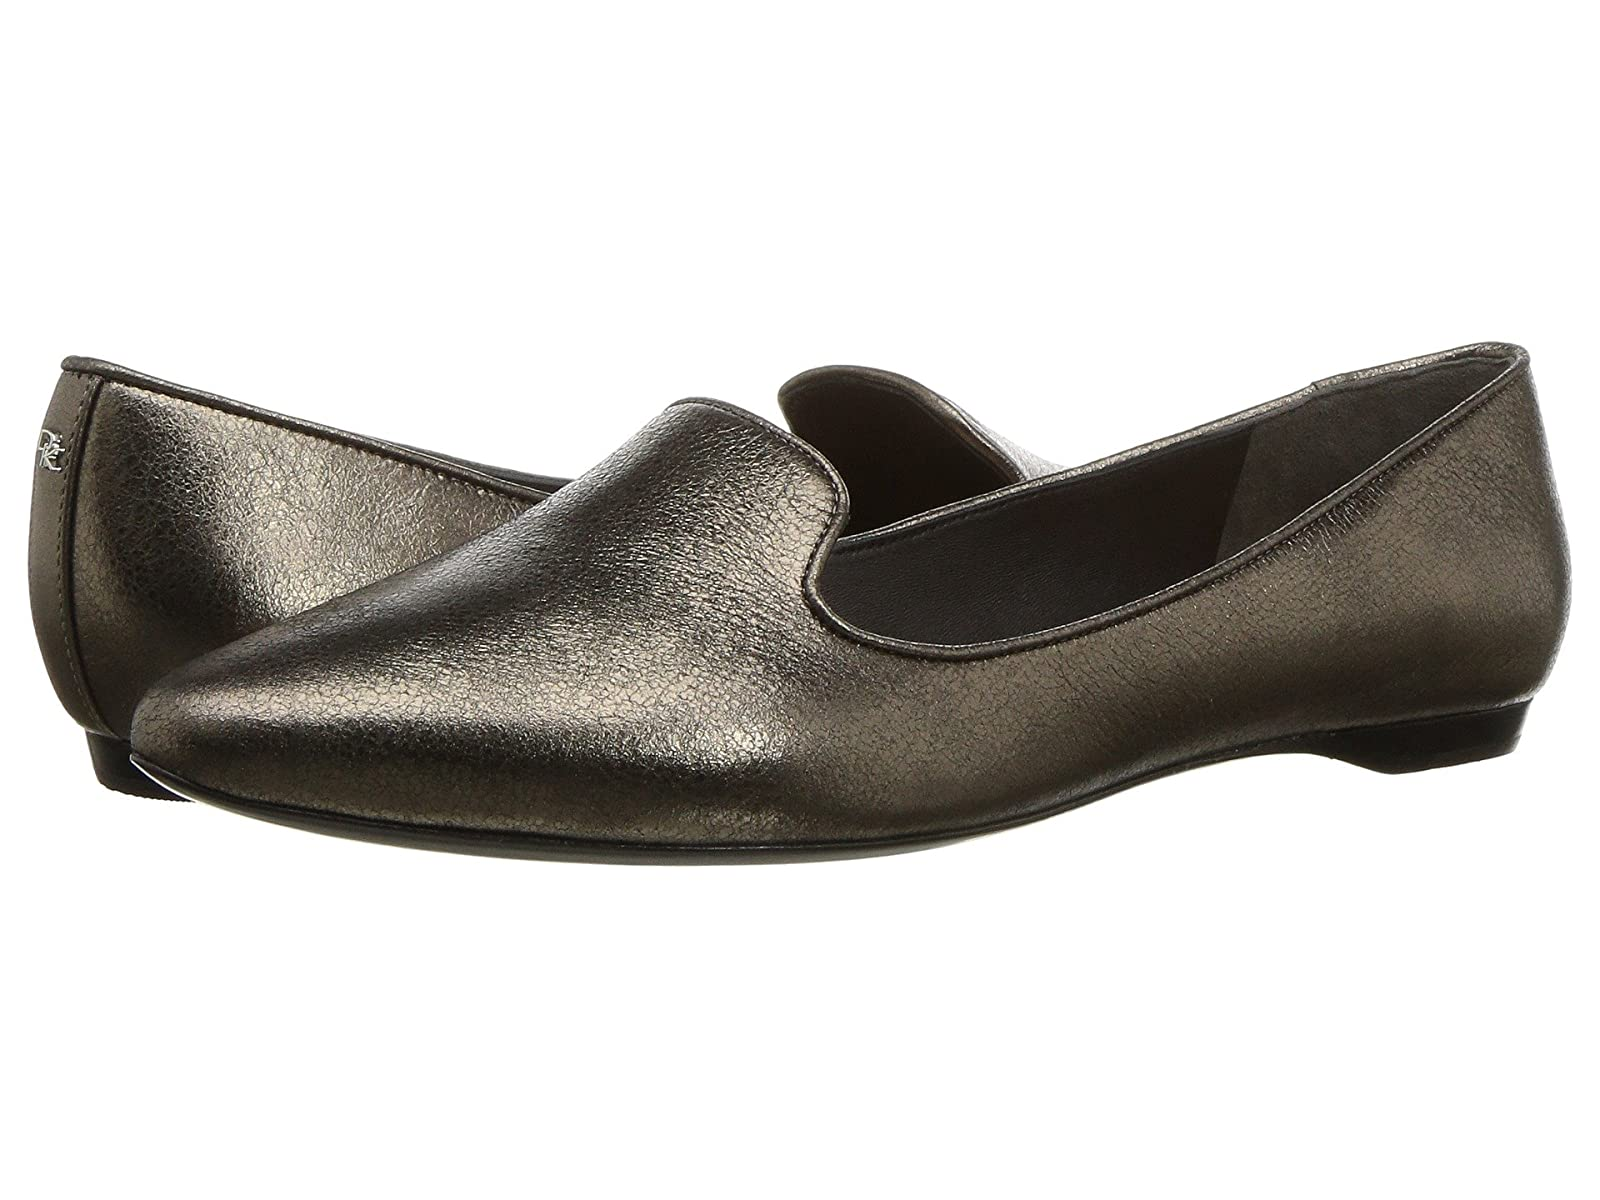 Donna Karan Gold LoaferCheap and distinctive eye-catching shoes